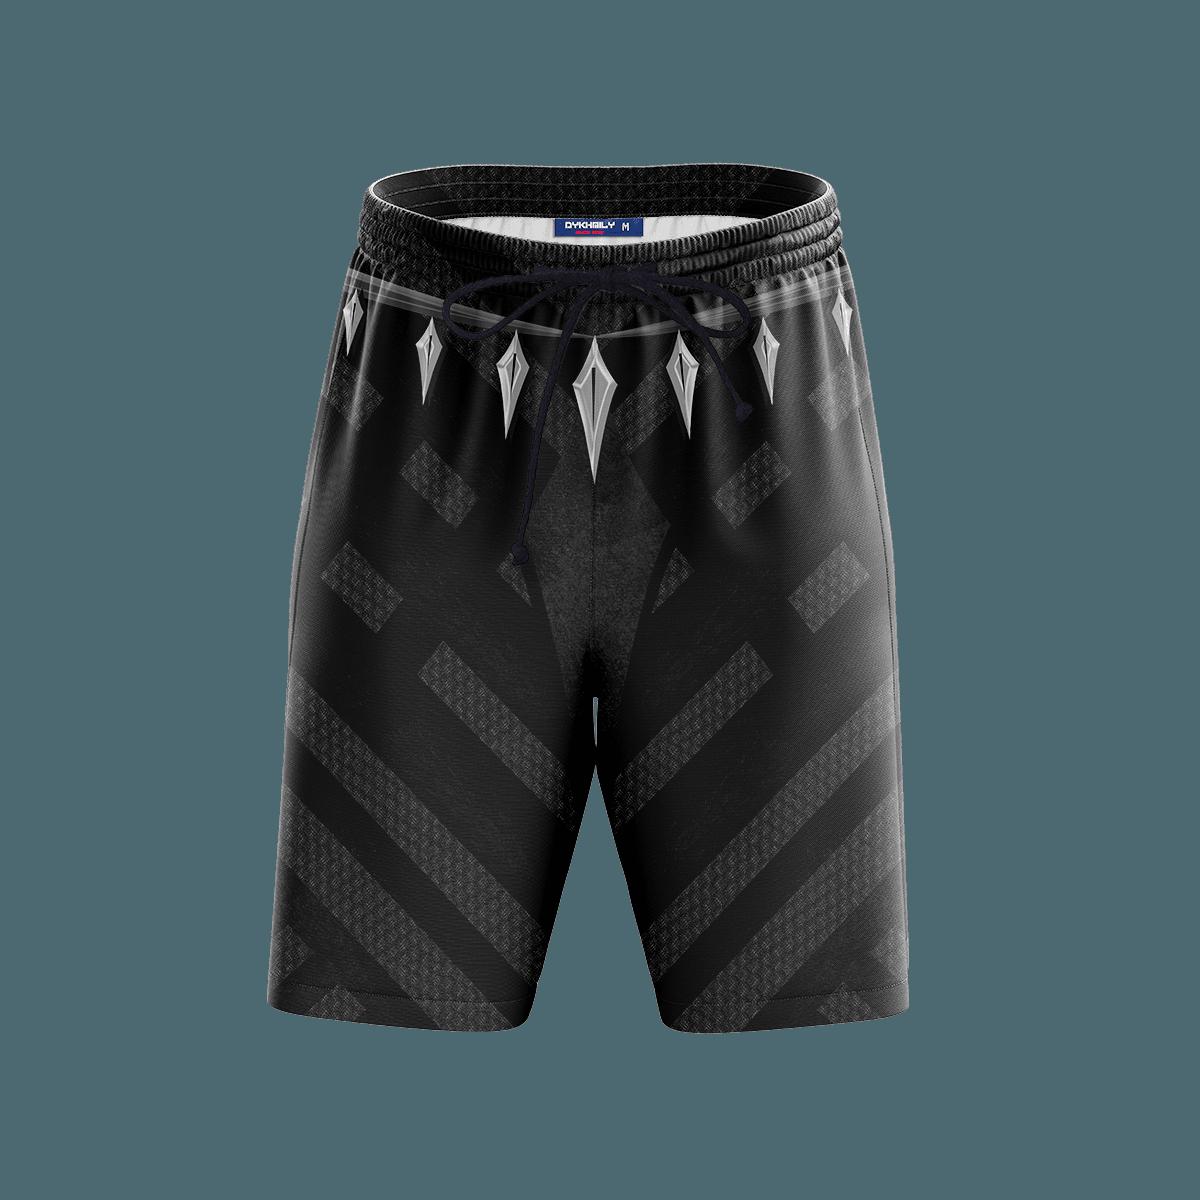 King's Mantle Beach Shorts FDM3107 S Official Anime Swimsuit Merch